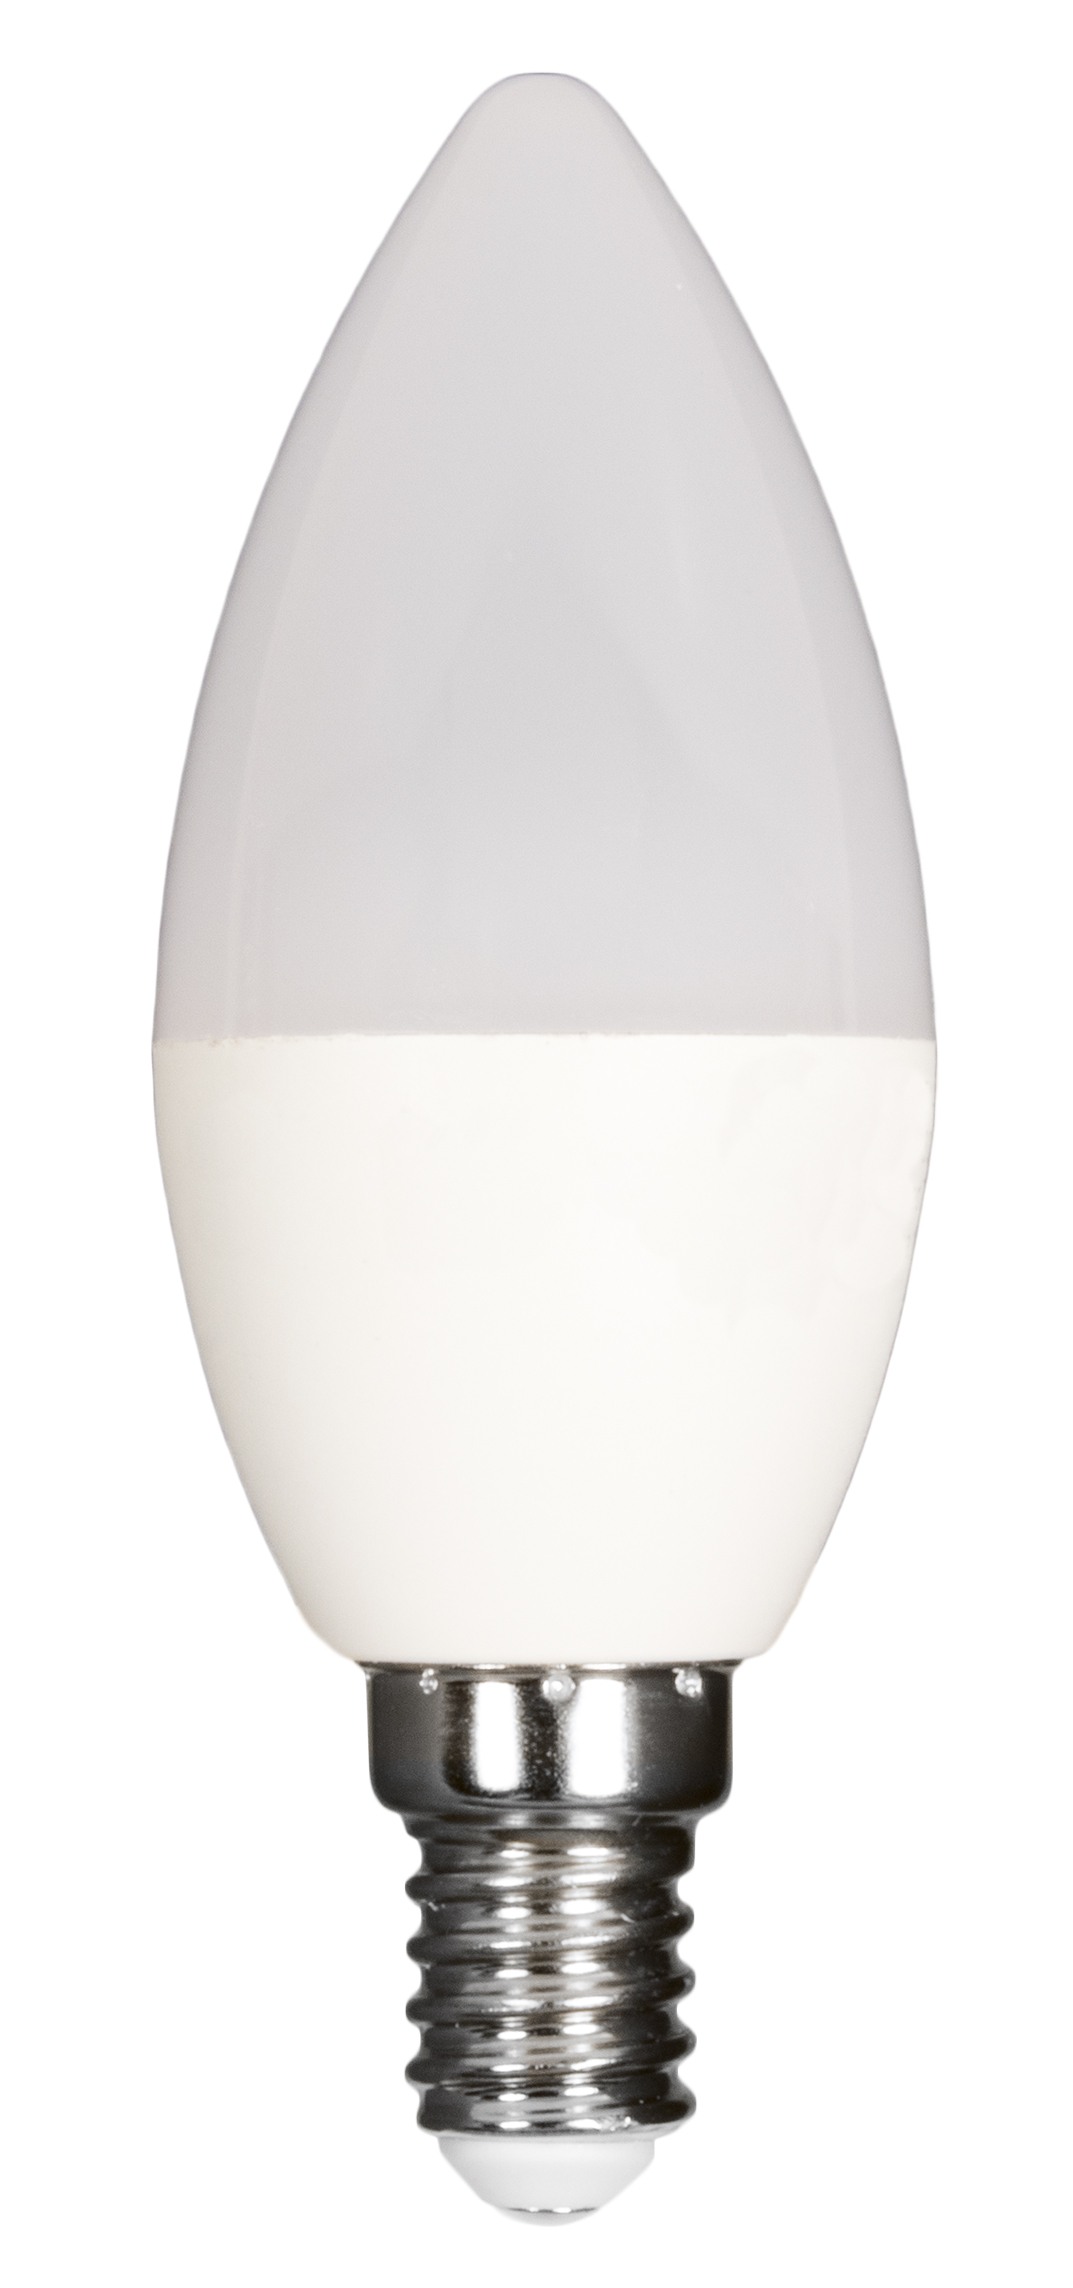 Buy Kodak C37 E14 Led Bulb Online In The Uk At Low Prices